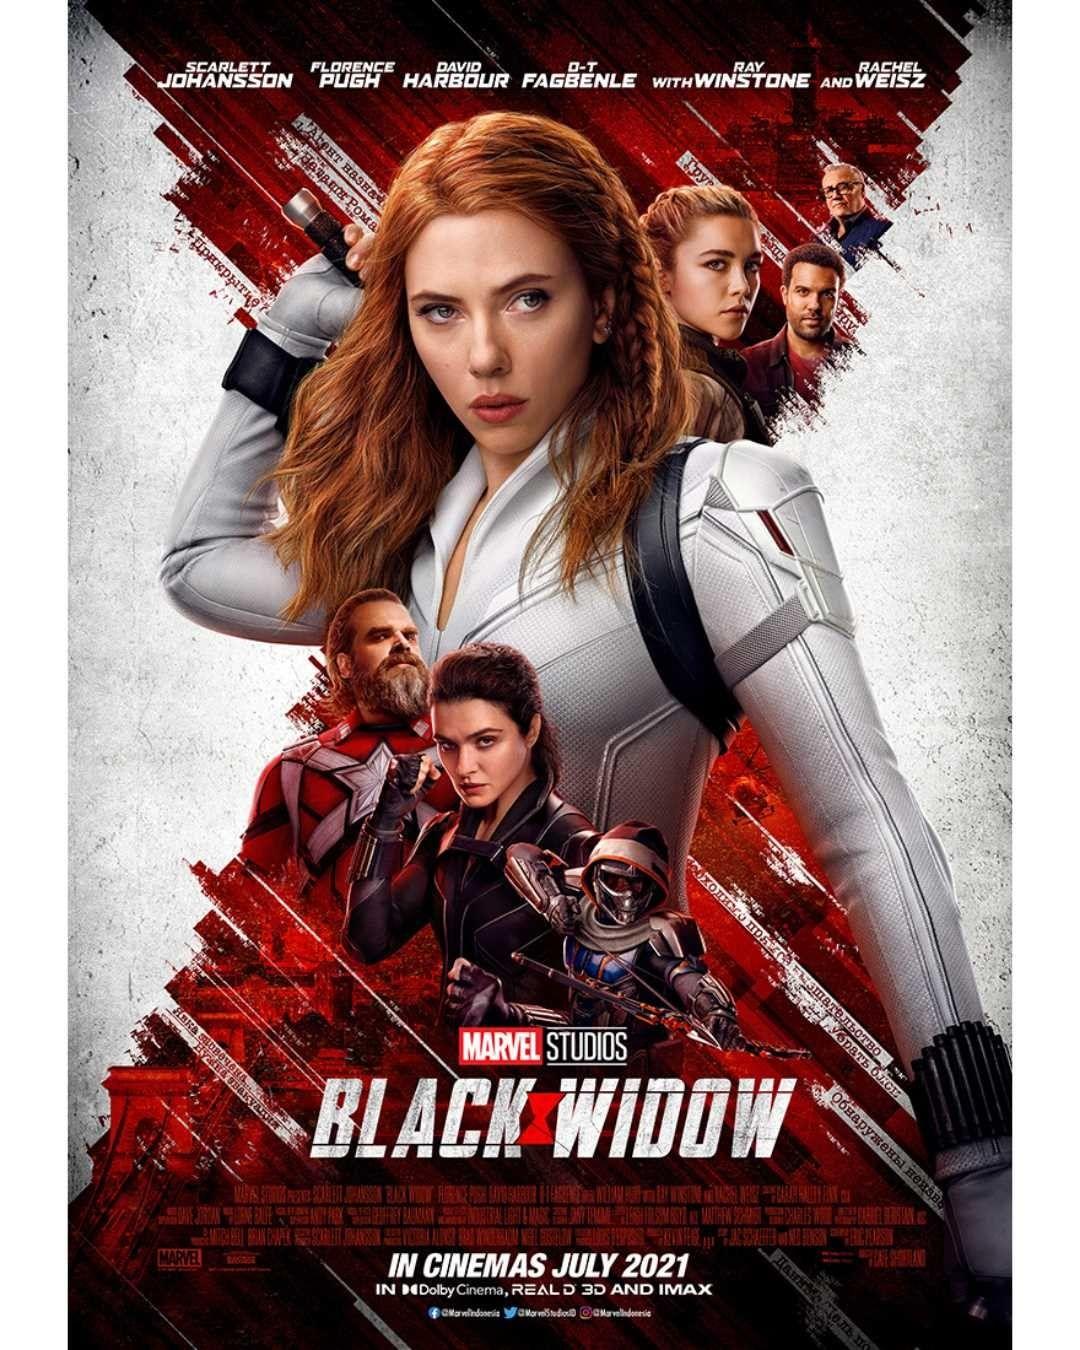 Black Widow Rilis di Disney+, Scarlett Johansson Tuntut Disney